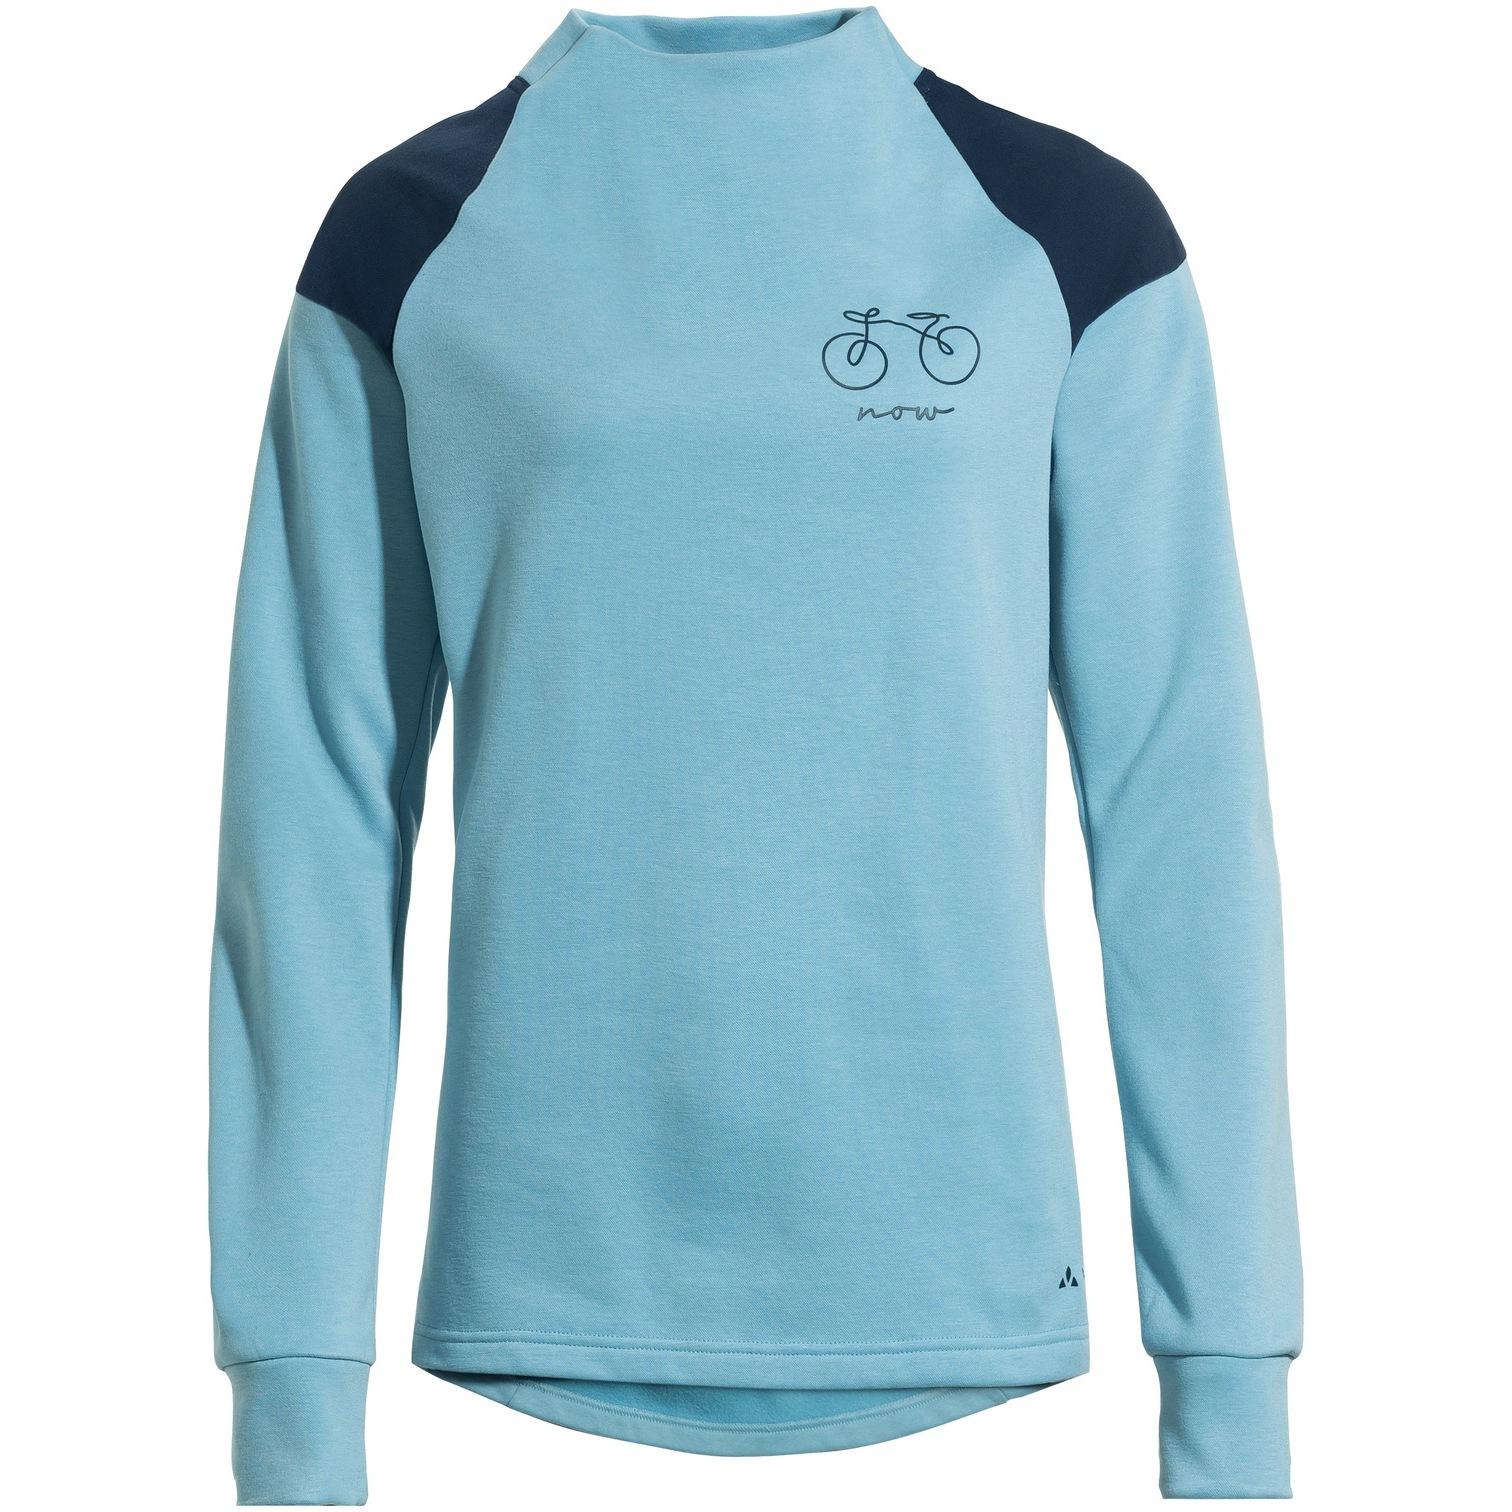 Vaude Women's Cyclist Sweater - dolphin